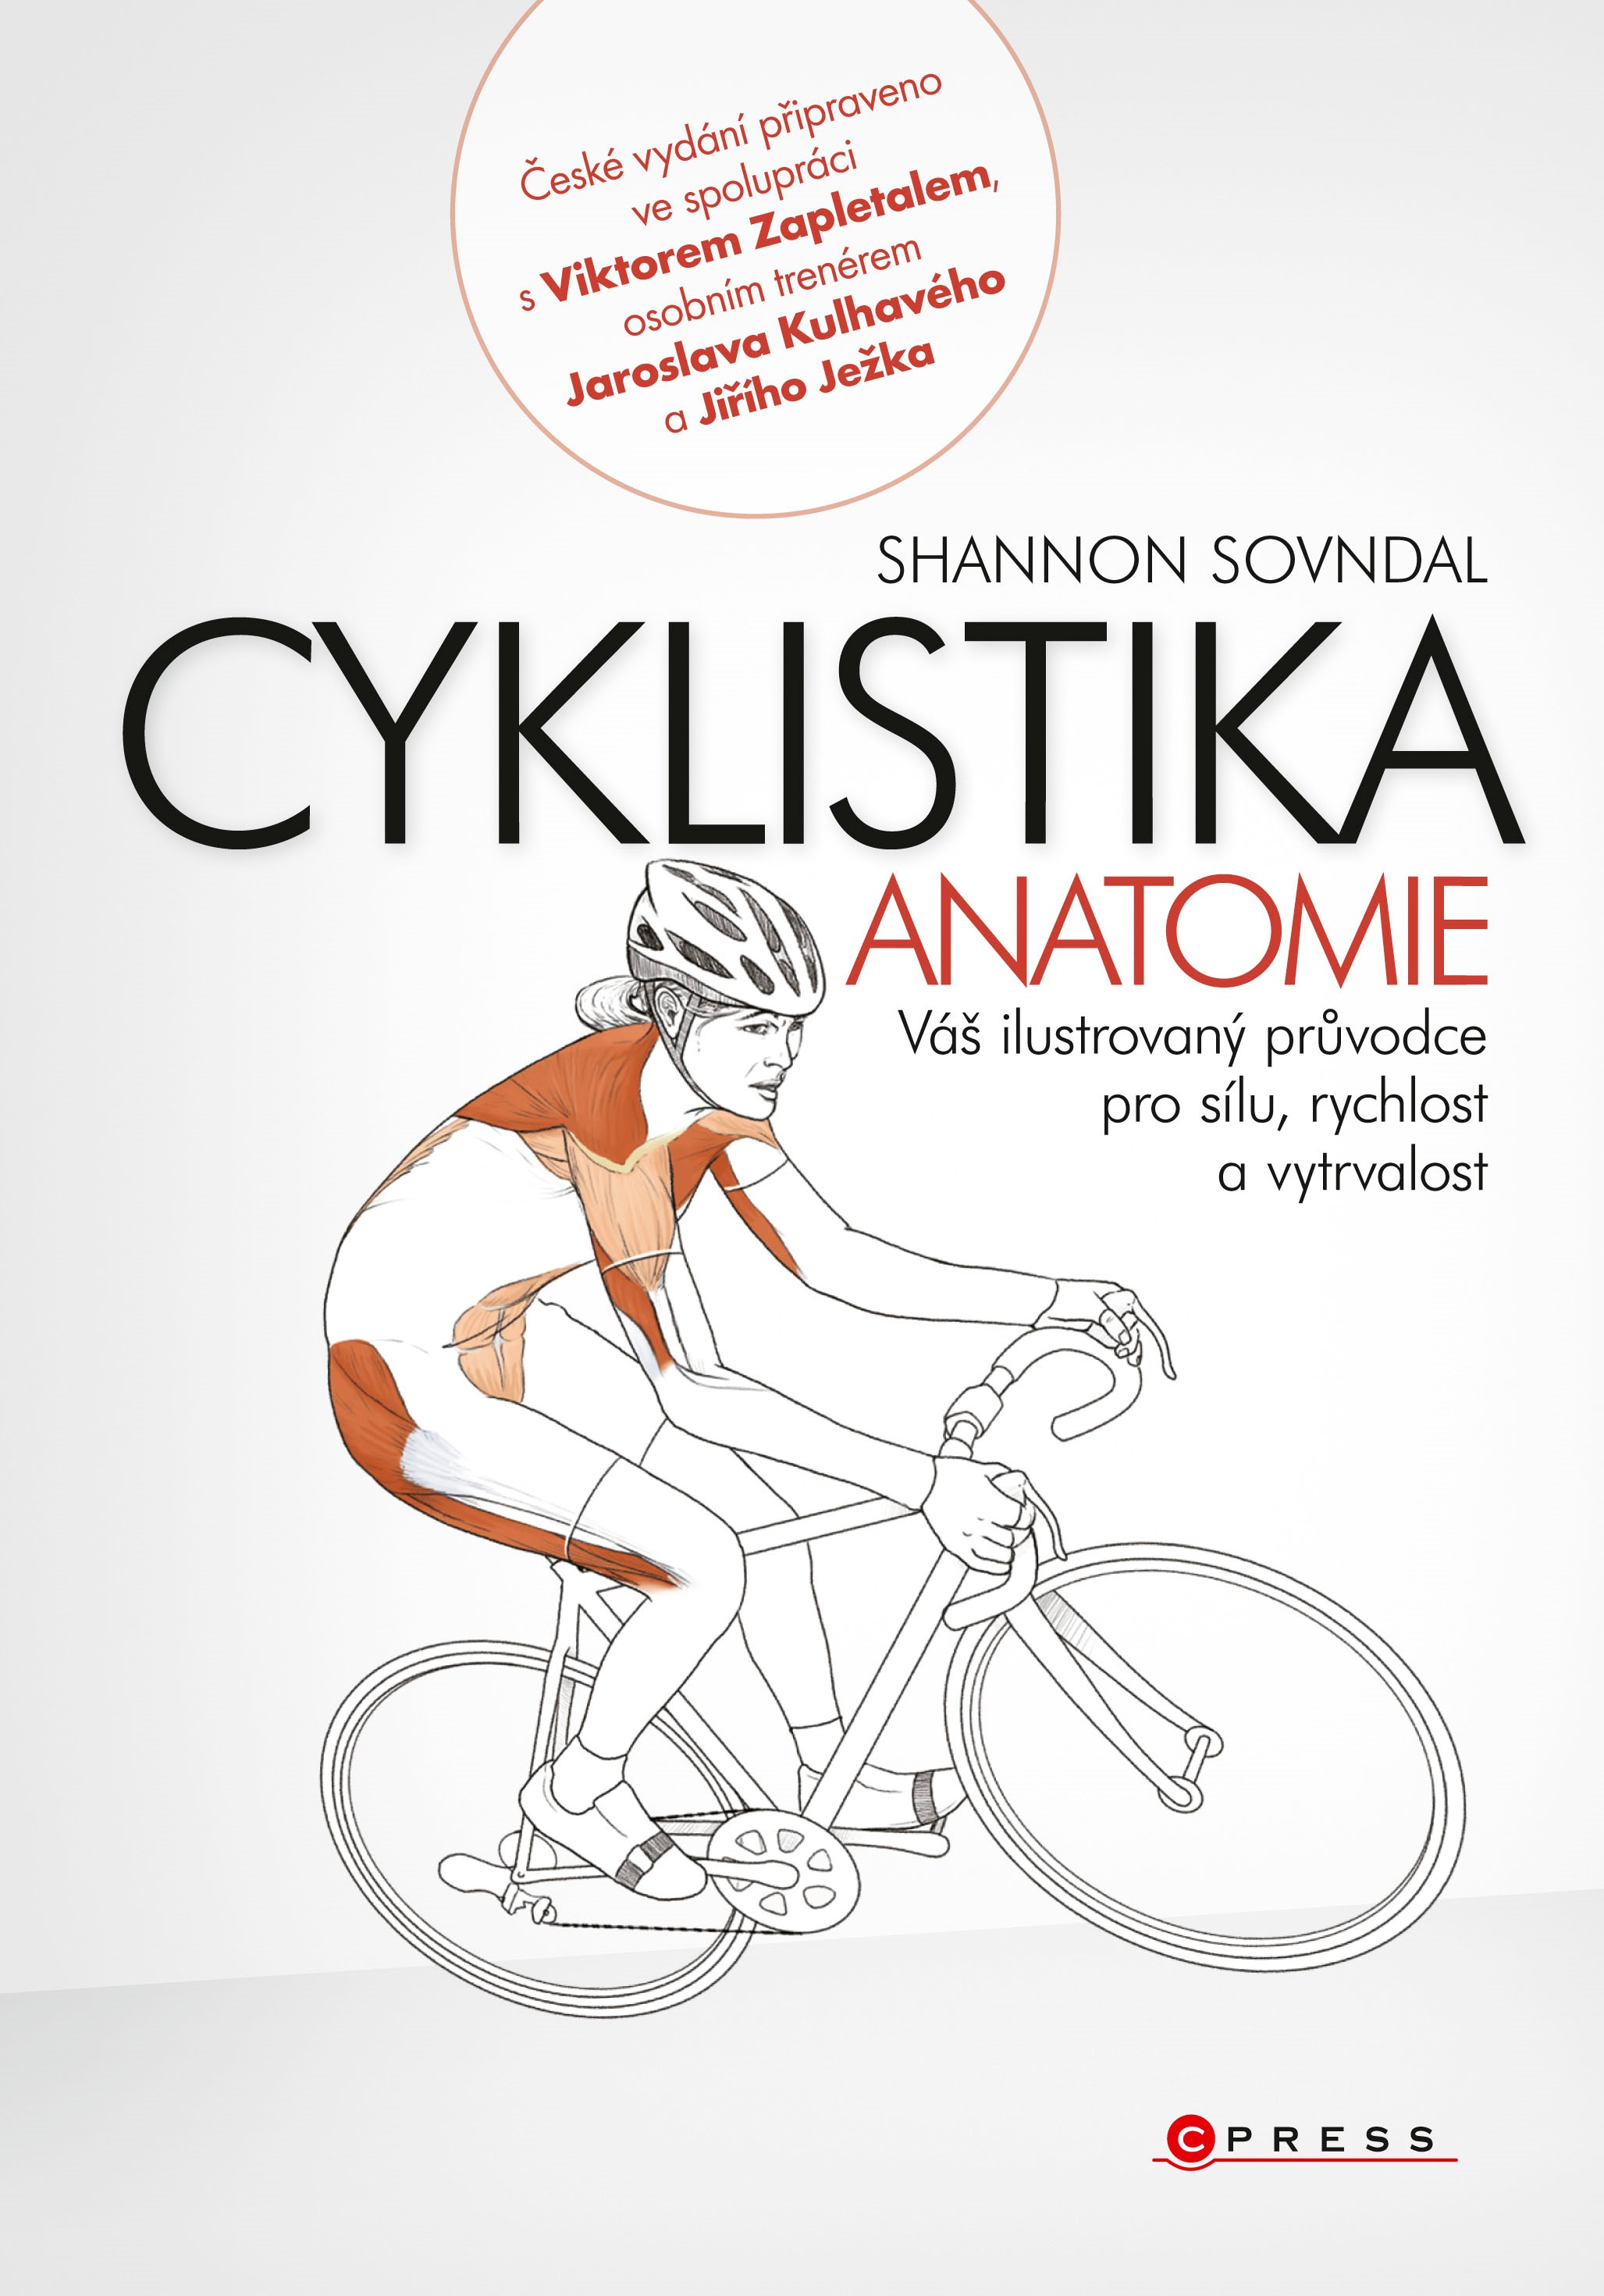 Cyklistika - anatomie | Shannon Sovndal